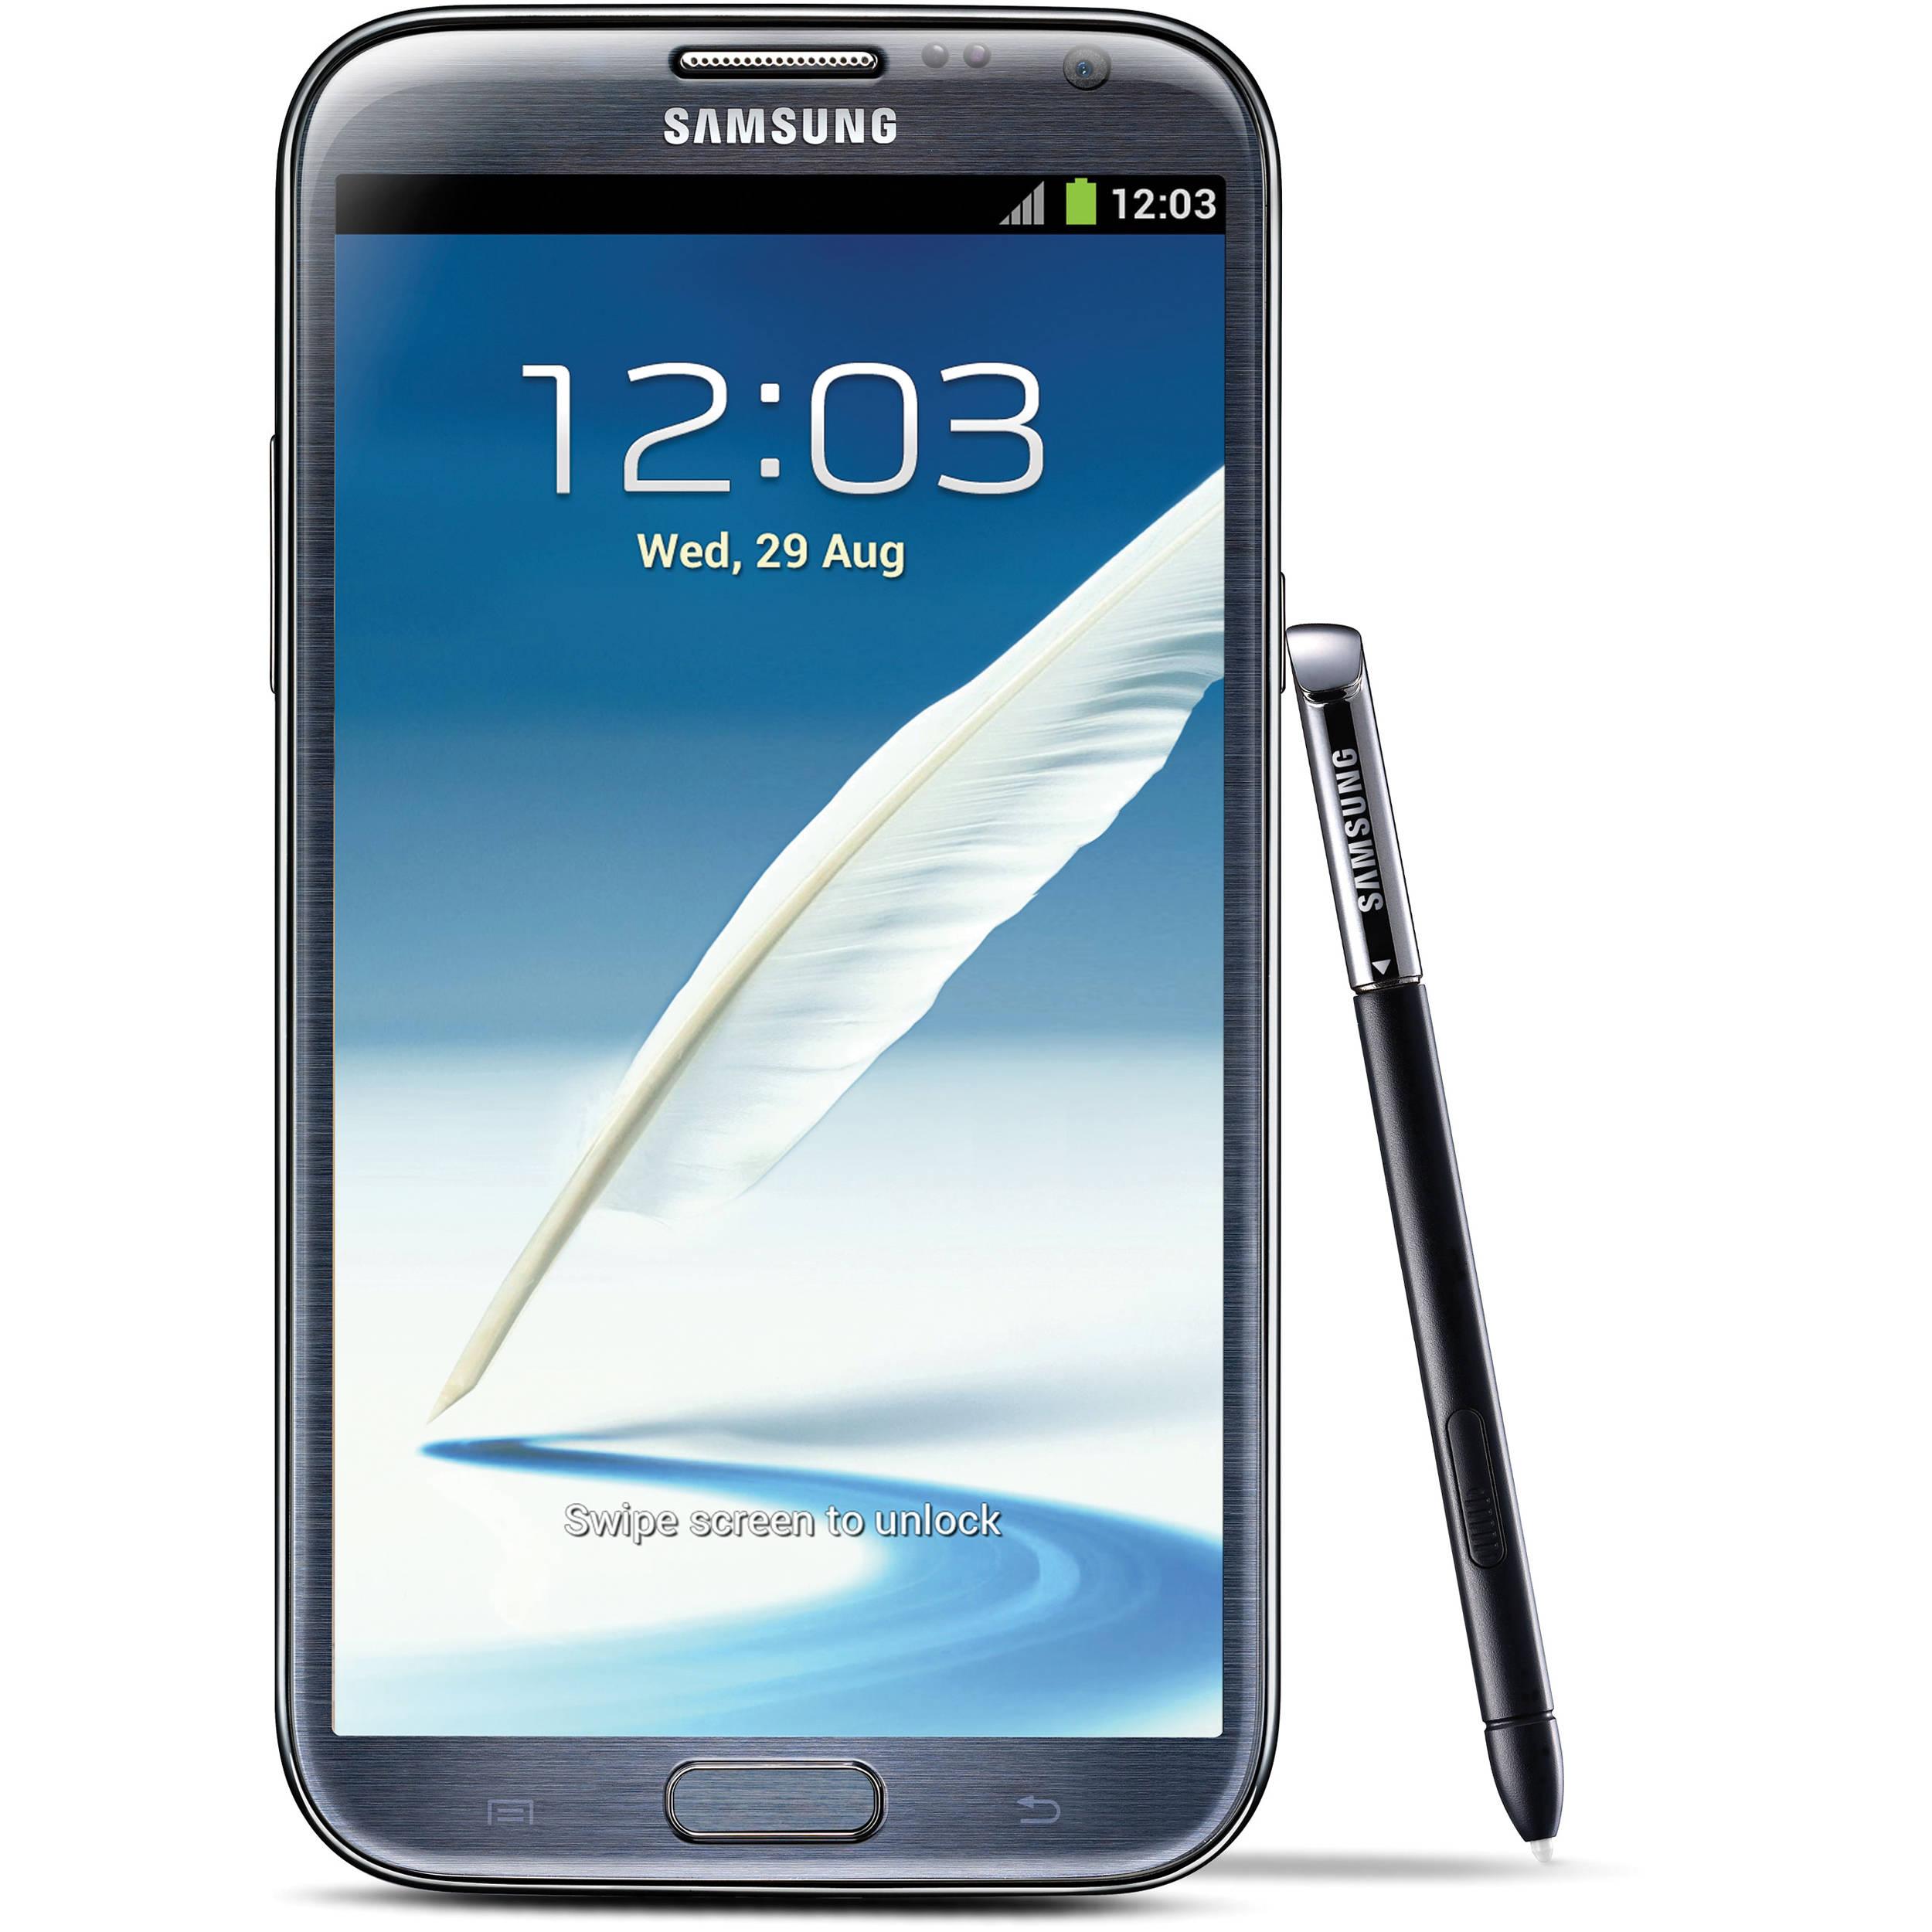 Samsung Galaxy Note 2 SGH-I317 16GB AT T Branded Smartphone (Unlocked,  Titanium) dc0ab24b03f2